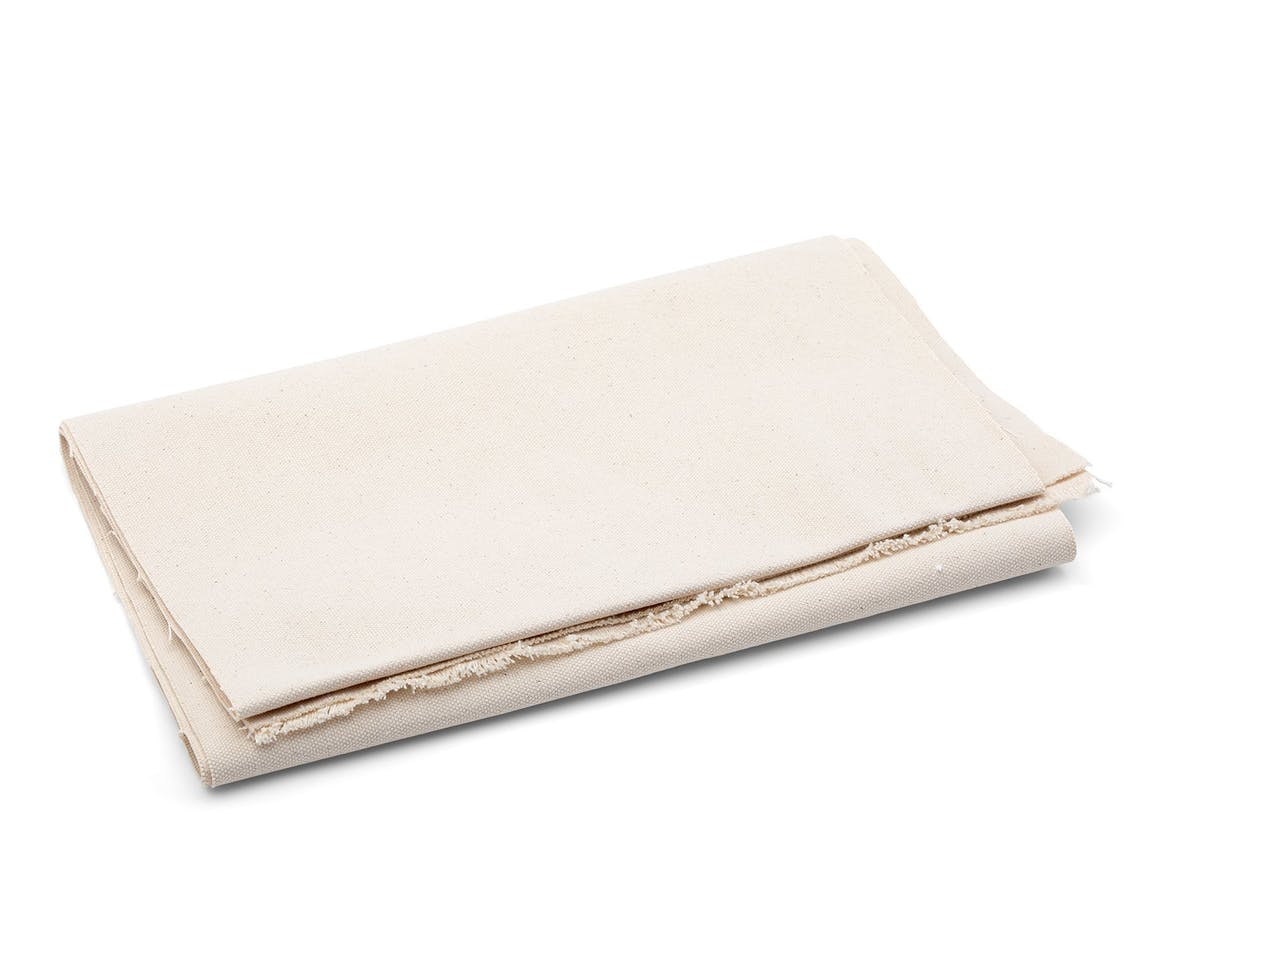 Baumwolle Nessel Standard uni, 760 g/m², b=1,5 m, Leinwandbindung, rohweiß, Segeltuch